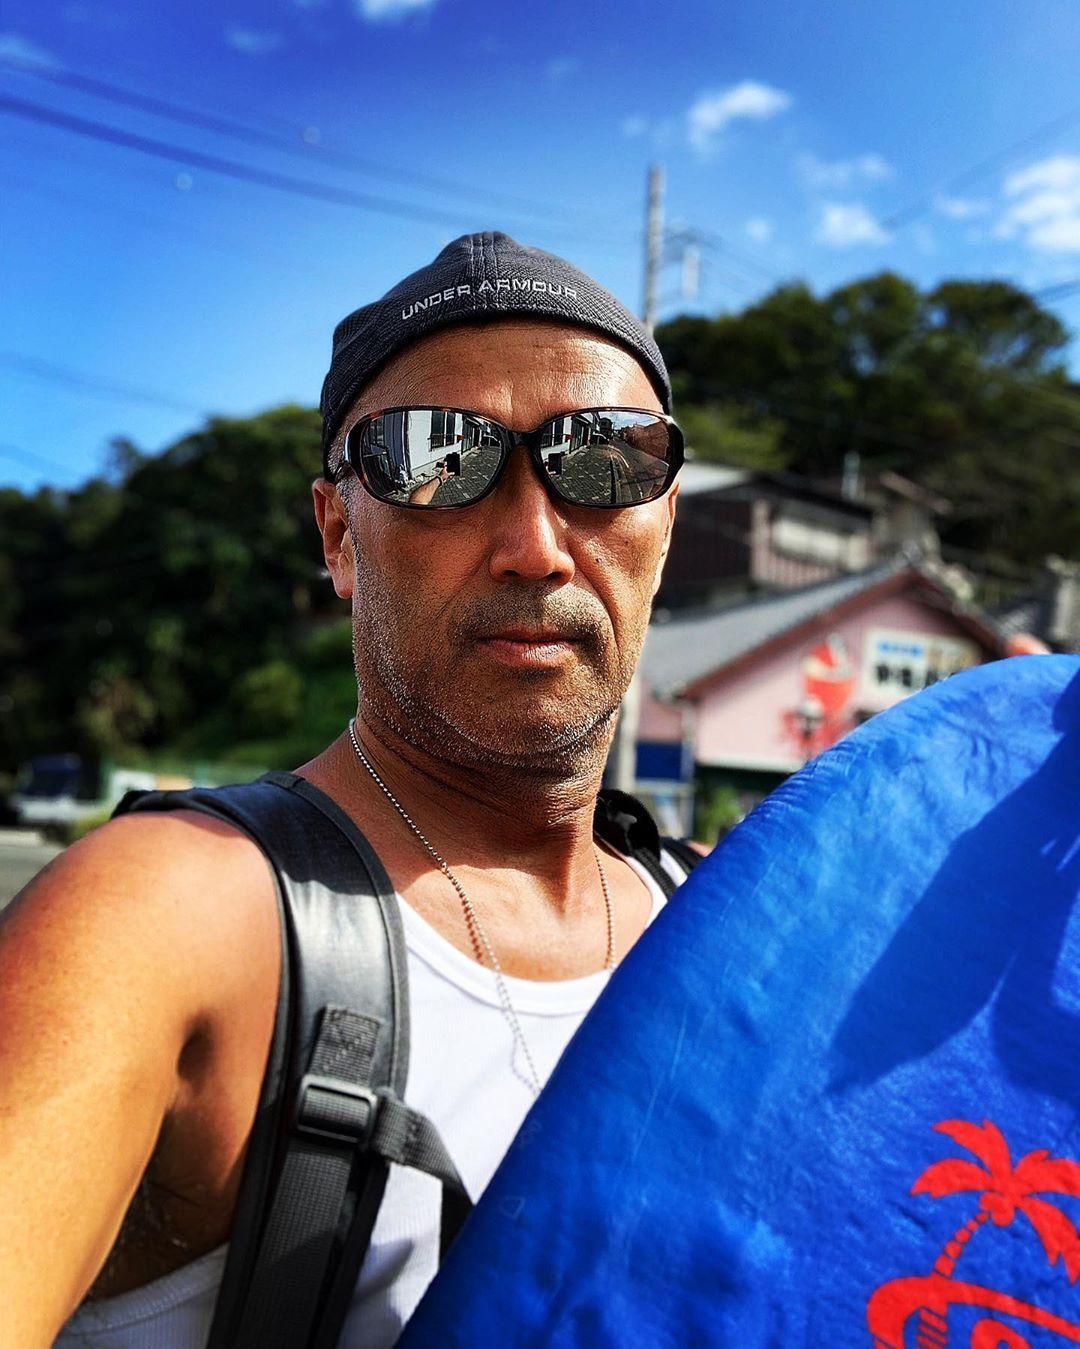 Surfer life 🌊🏄♂️ #apparel #surfing #surfer #model #fitness #snapshot #applewatch #iphoneXanax #sung...